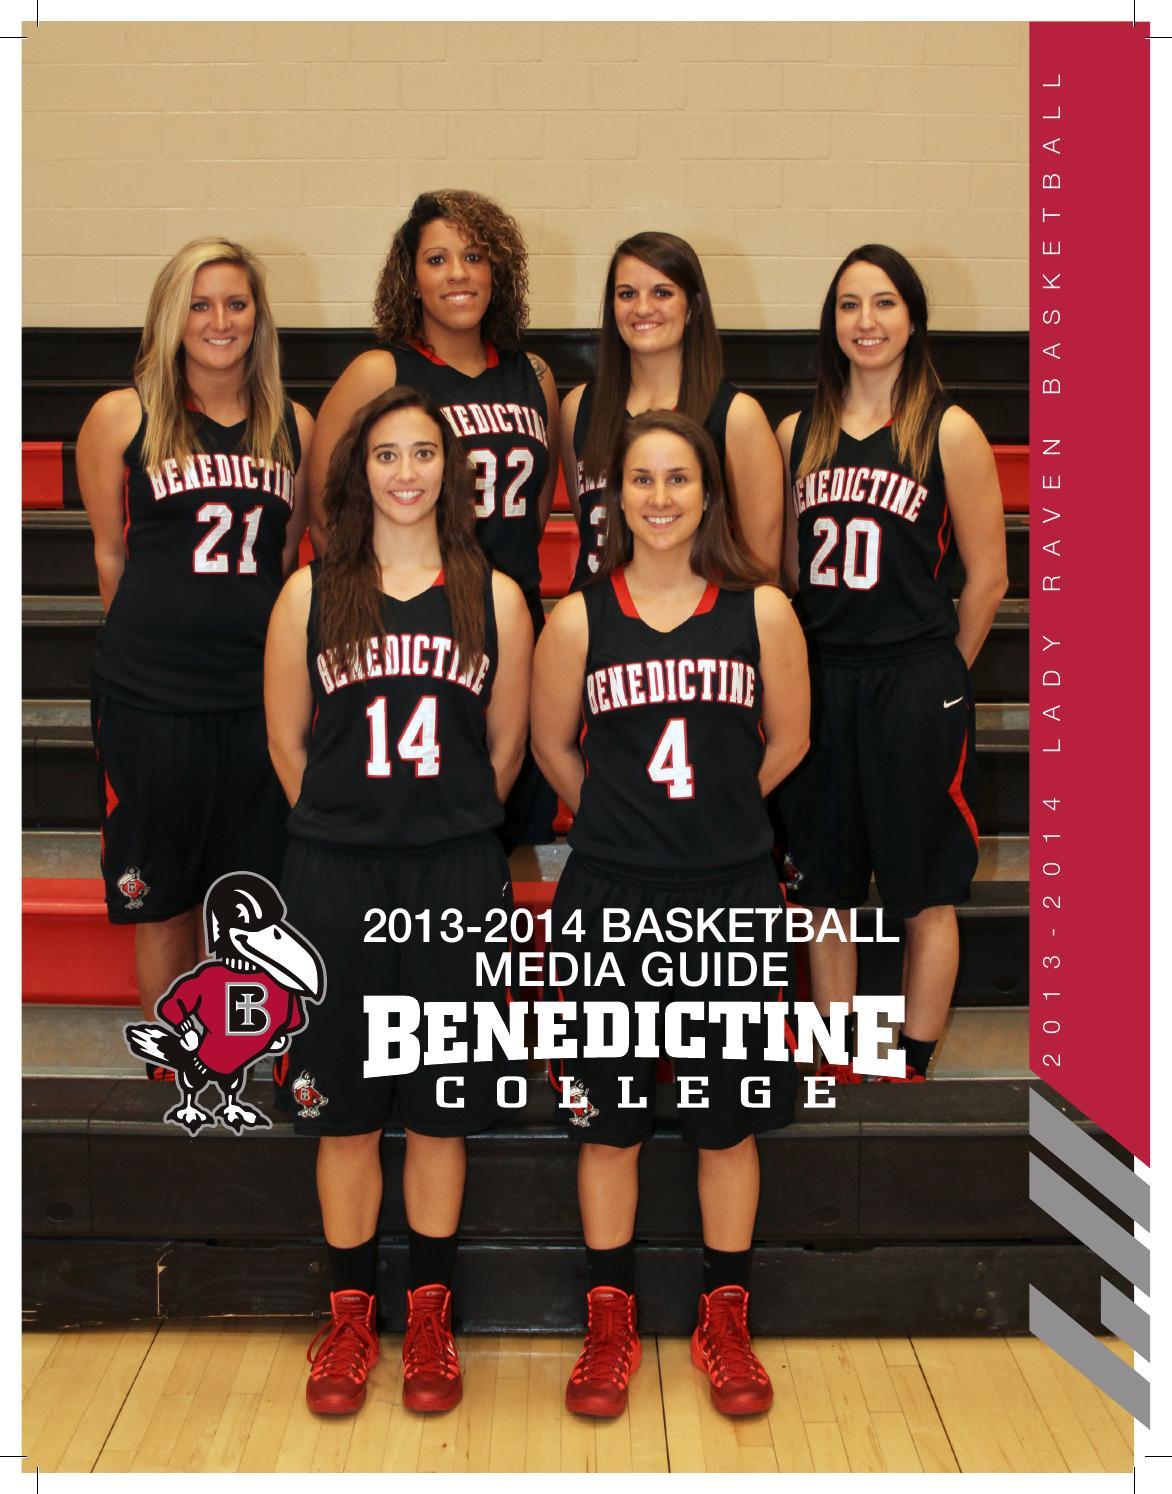 4ebeee5732 2013-14 Benedictine College Women's Basketball Media Guide by Raven  Athletics - issuu